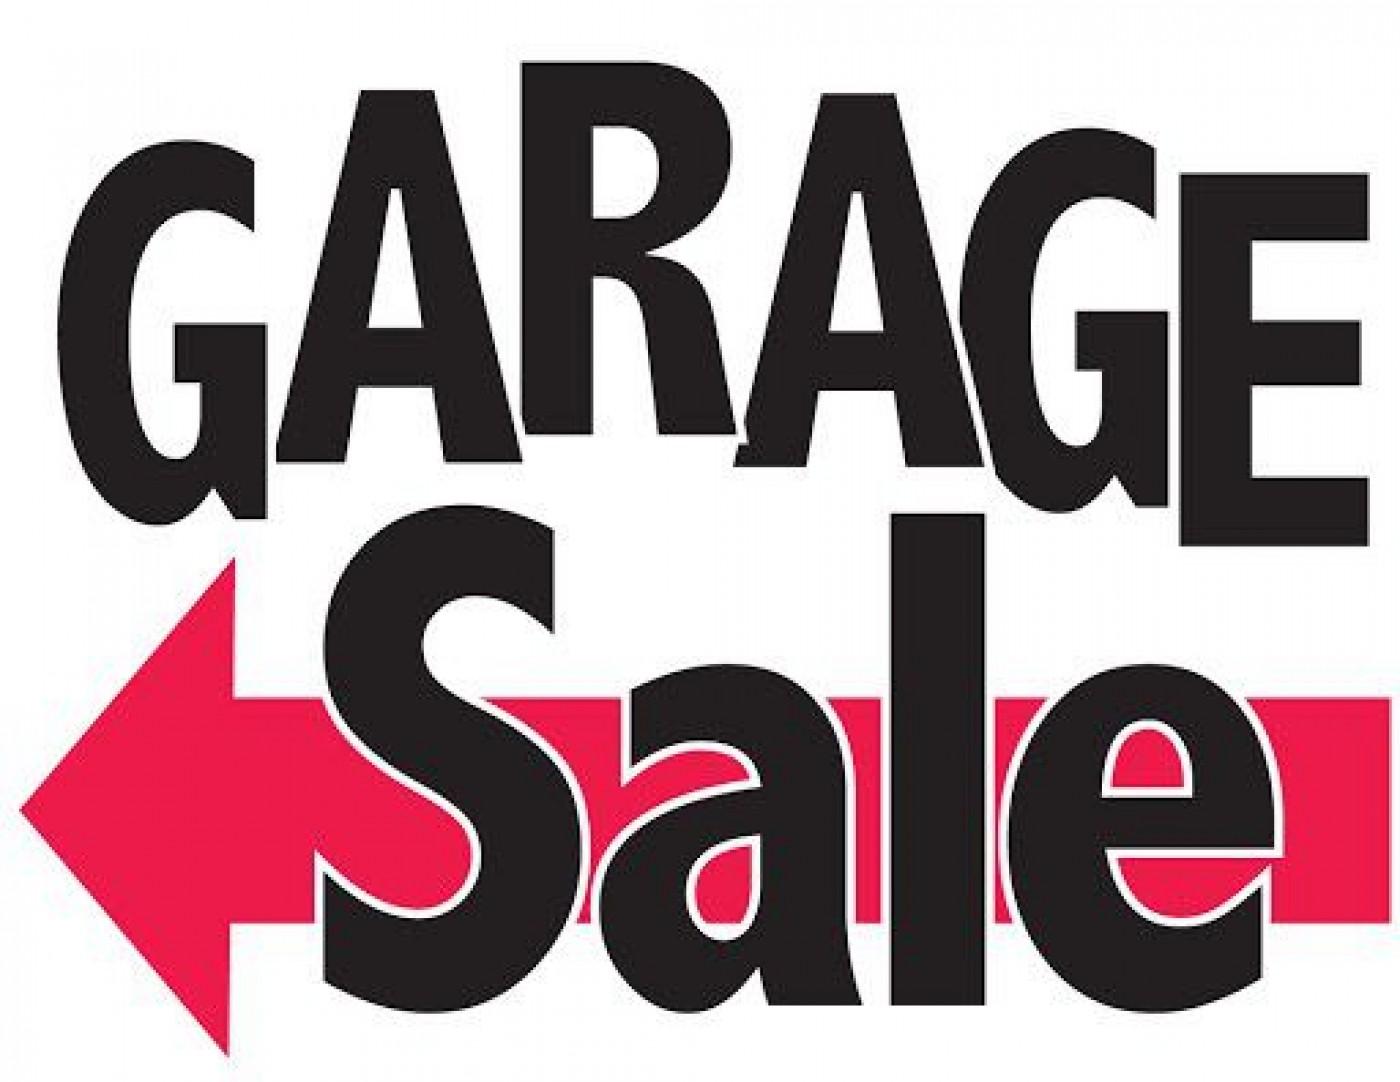 002 Dreaded Garage Sale Sign Template High Def  Flyer Yard Microsoft Word1400